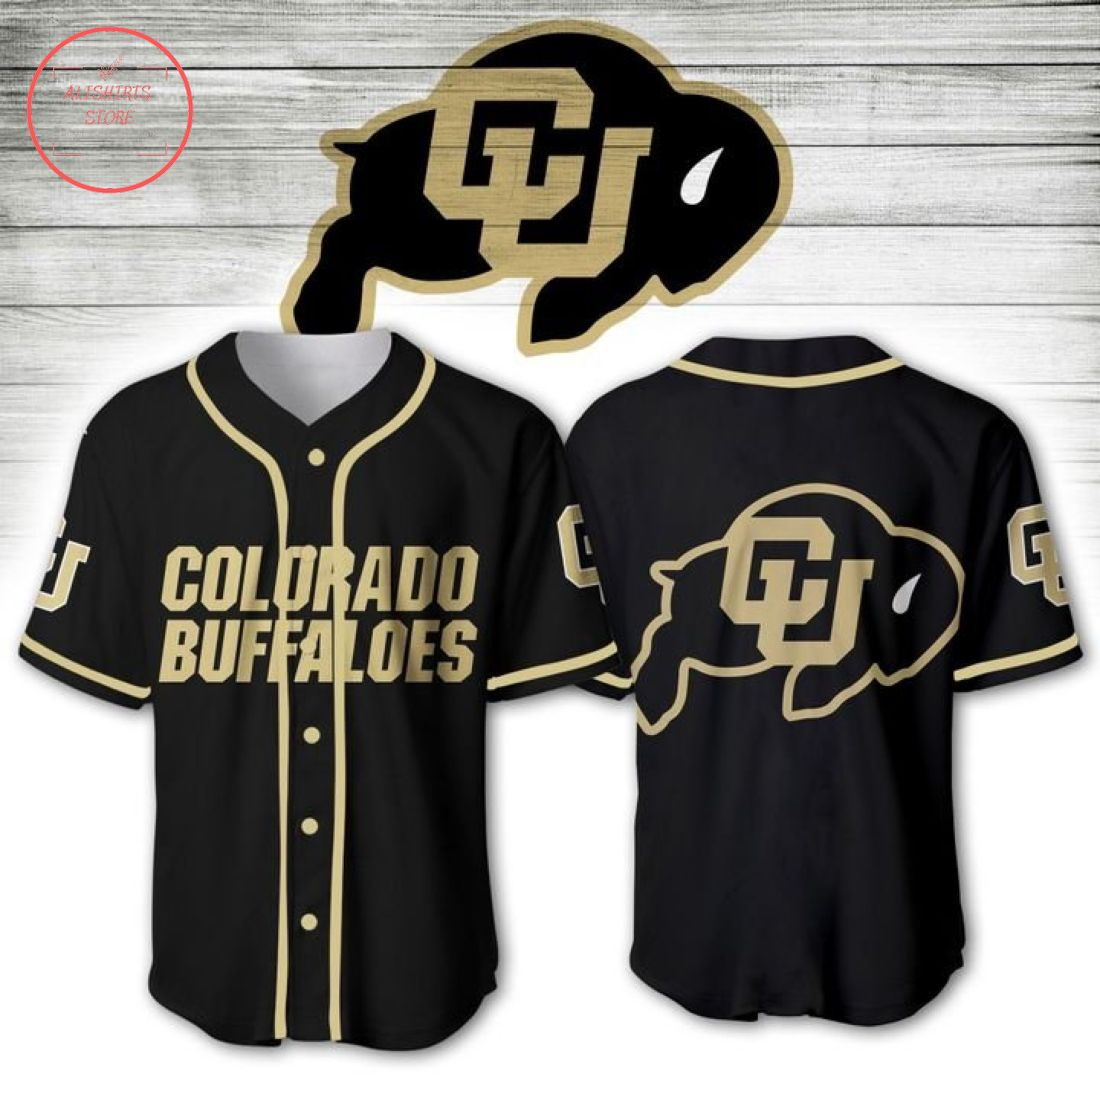 Colorado Buffaloes NCAA Baseball Jersey